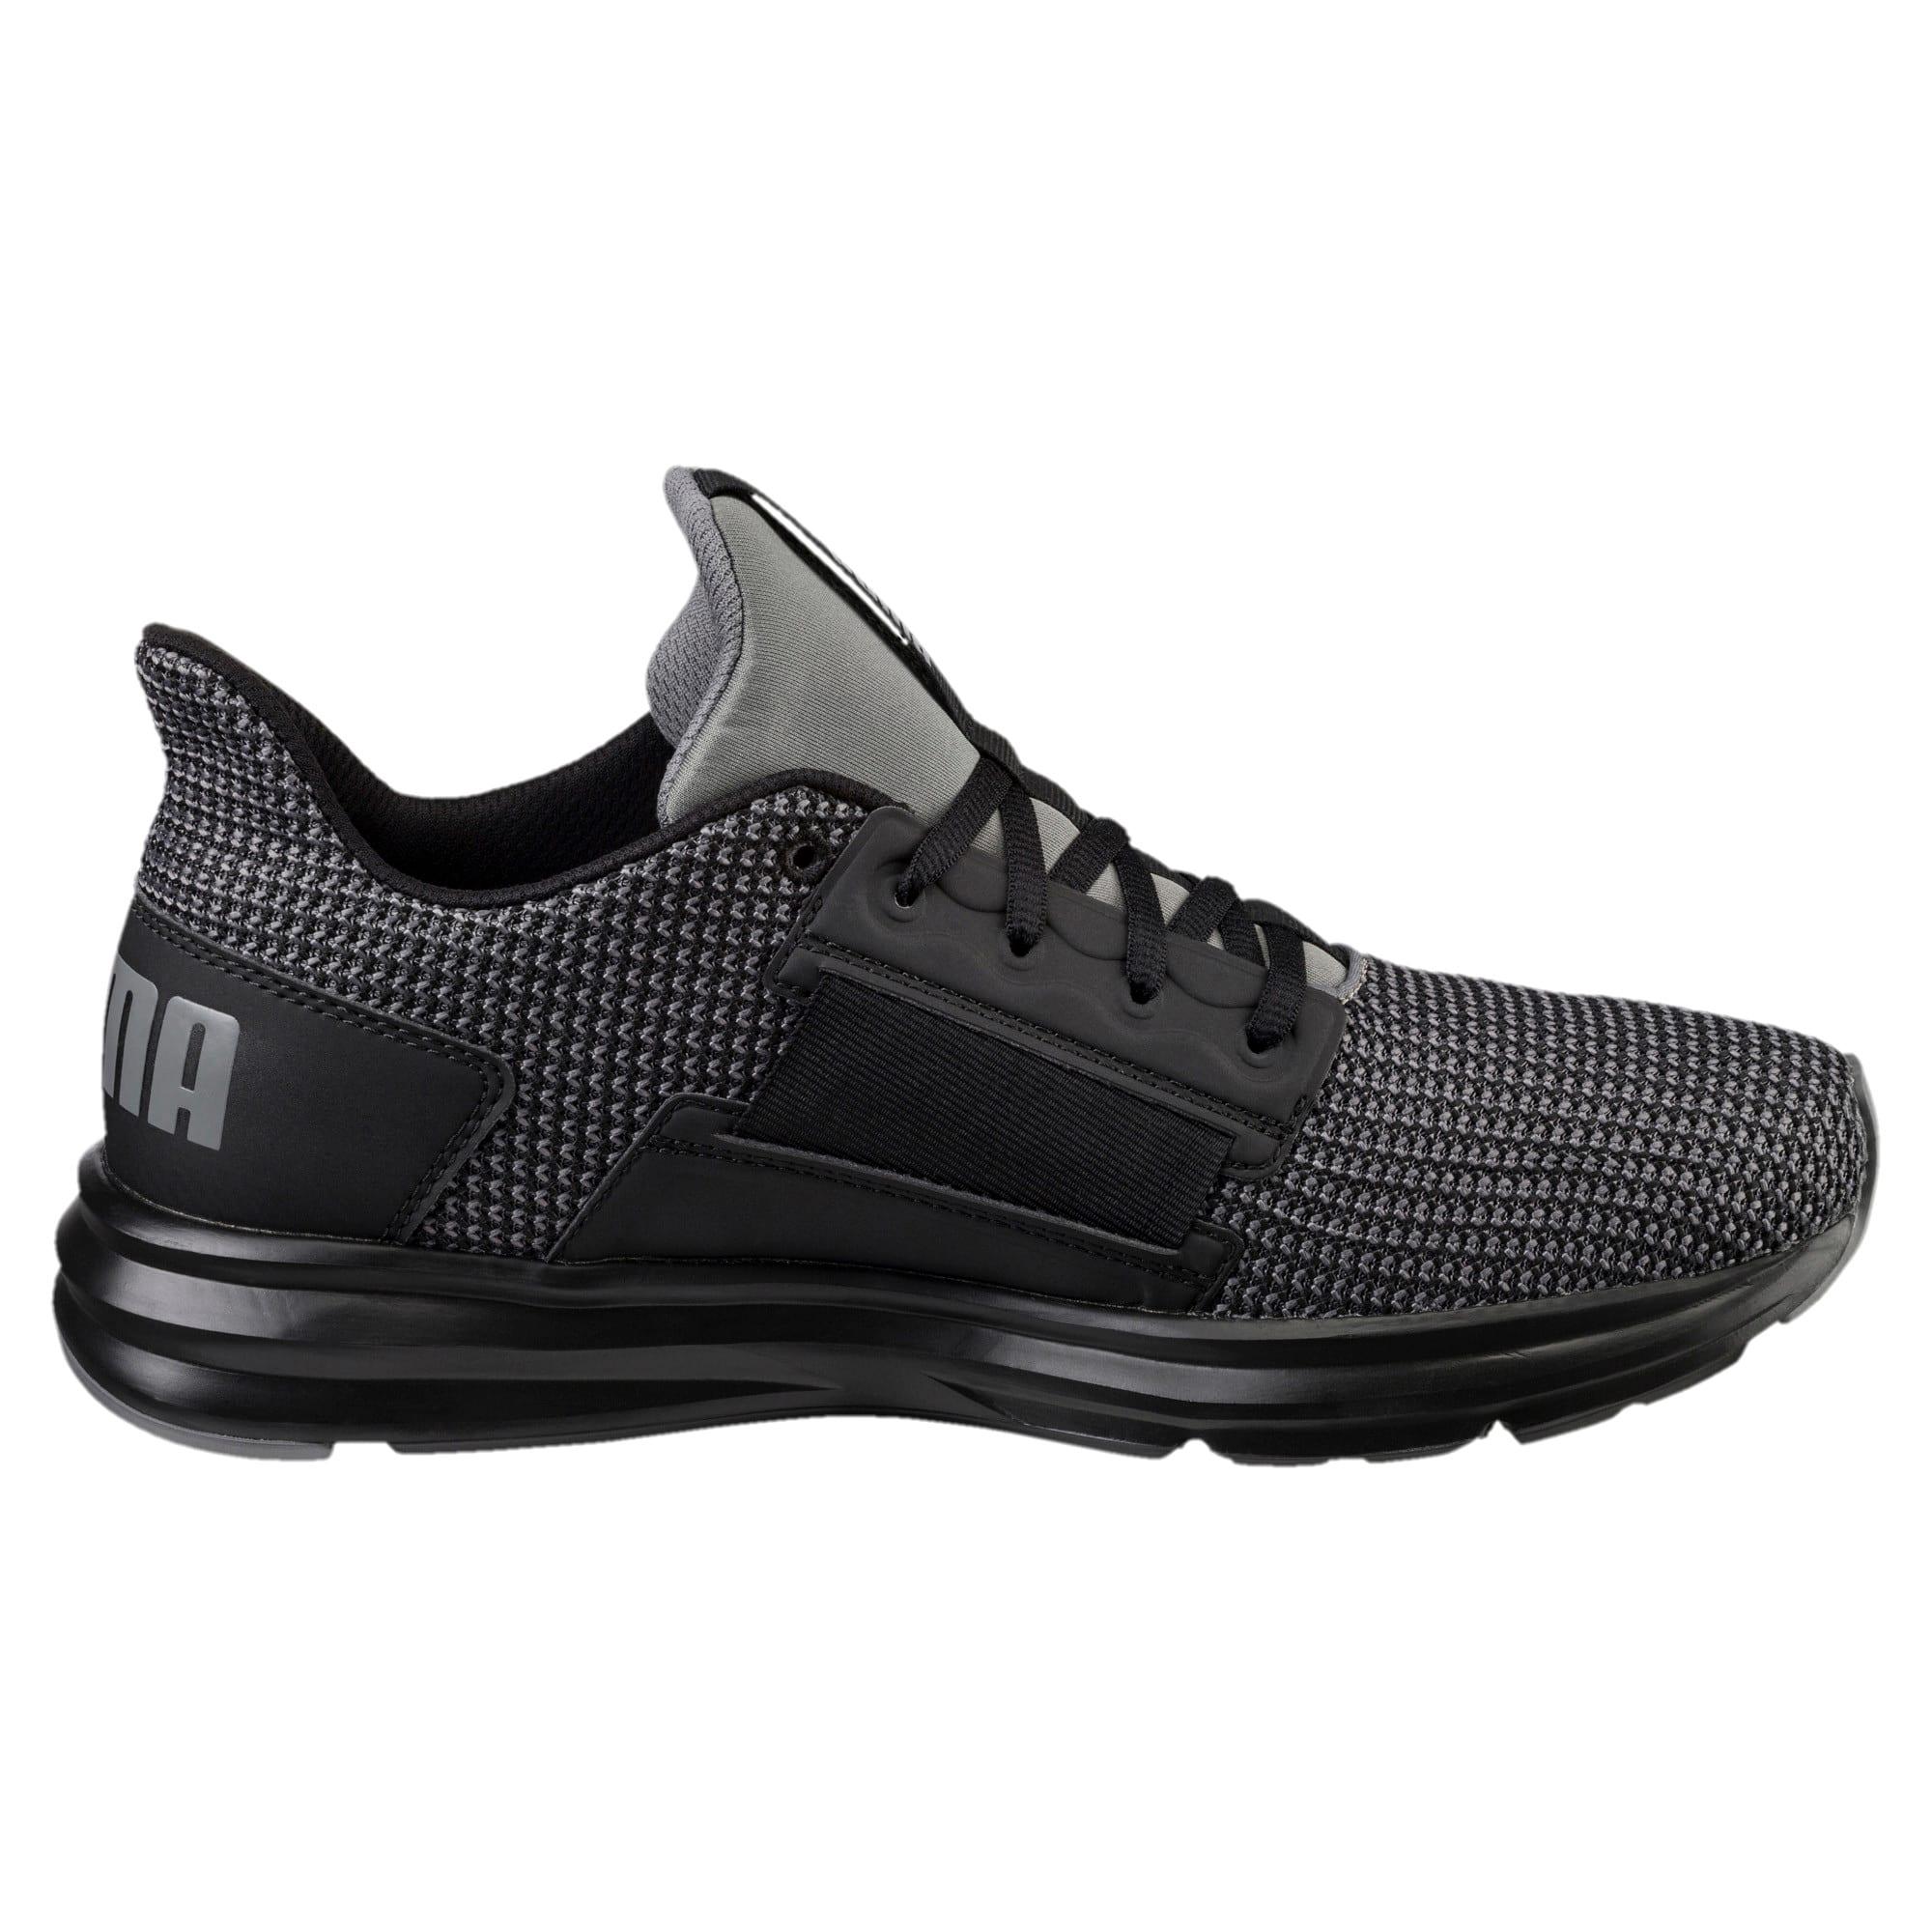 Thumbnail 4 of Enzo Street Knit Men's Running Shoes, QUIET SHADE-Puma Black, medium-IND